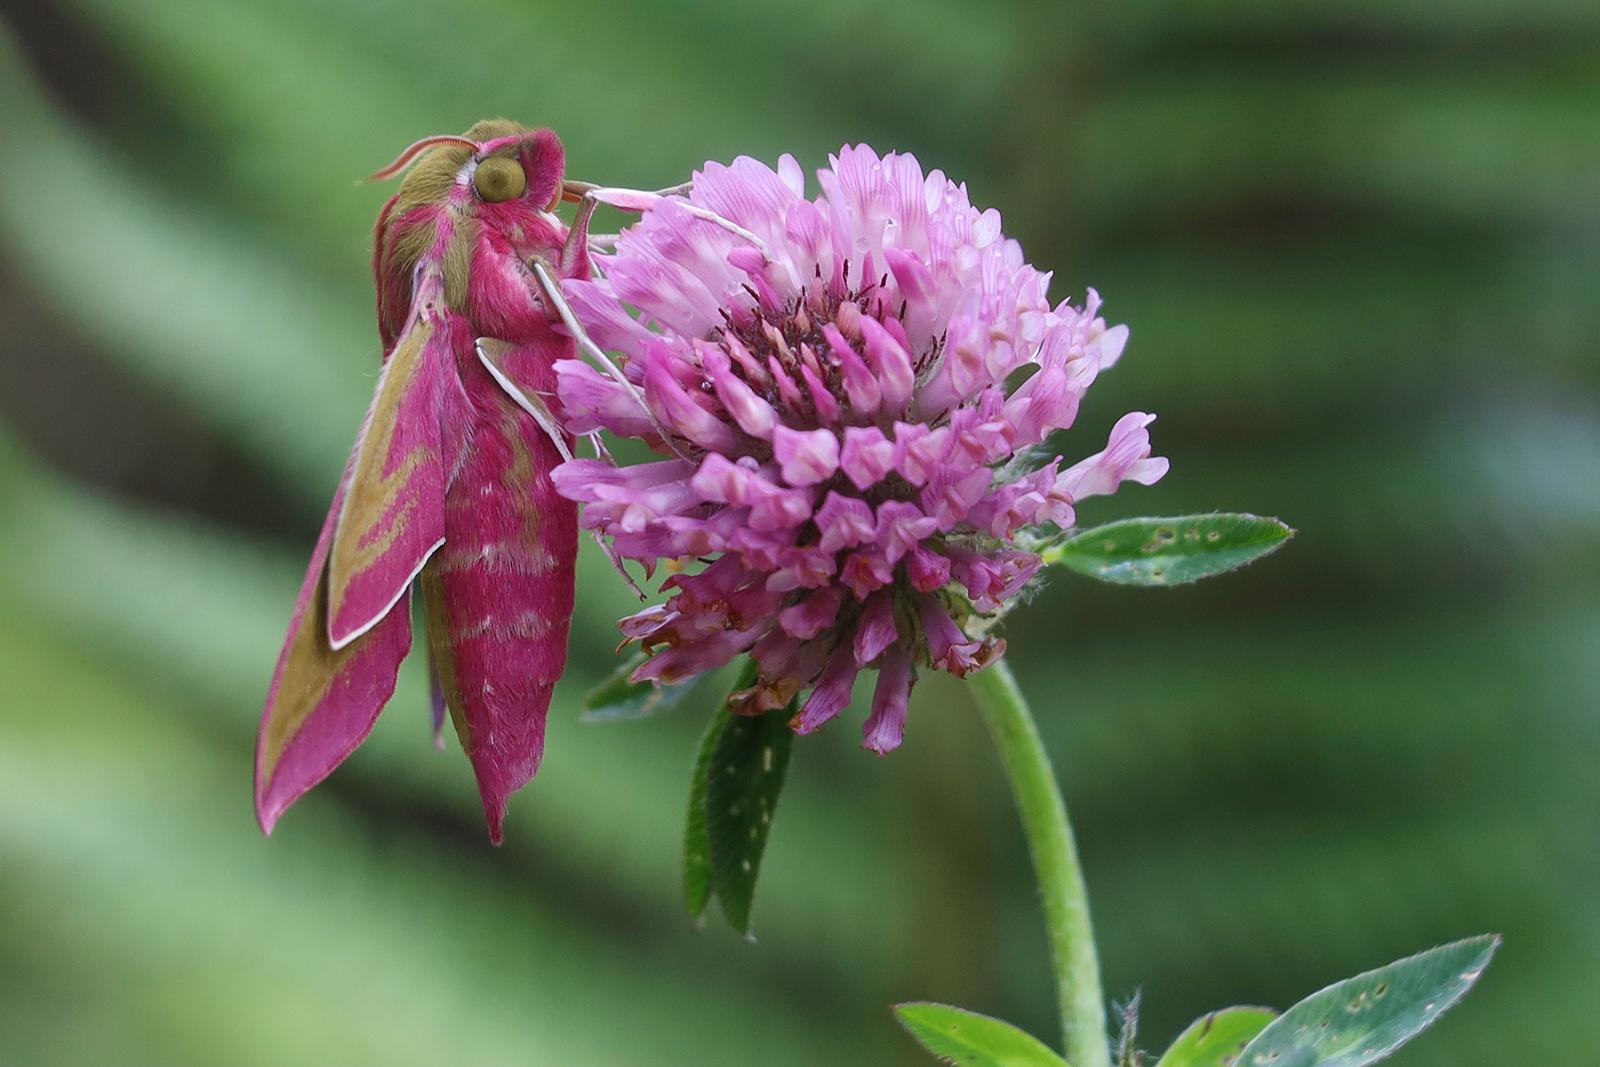 Elephant Hawk Moth on Clover flower Colette Gemmell Breffni Club